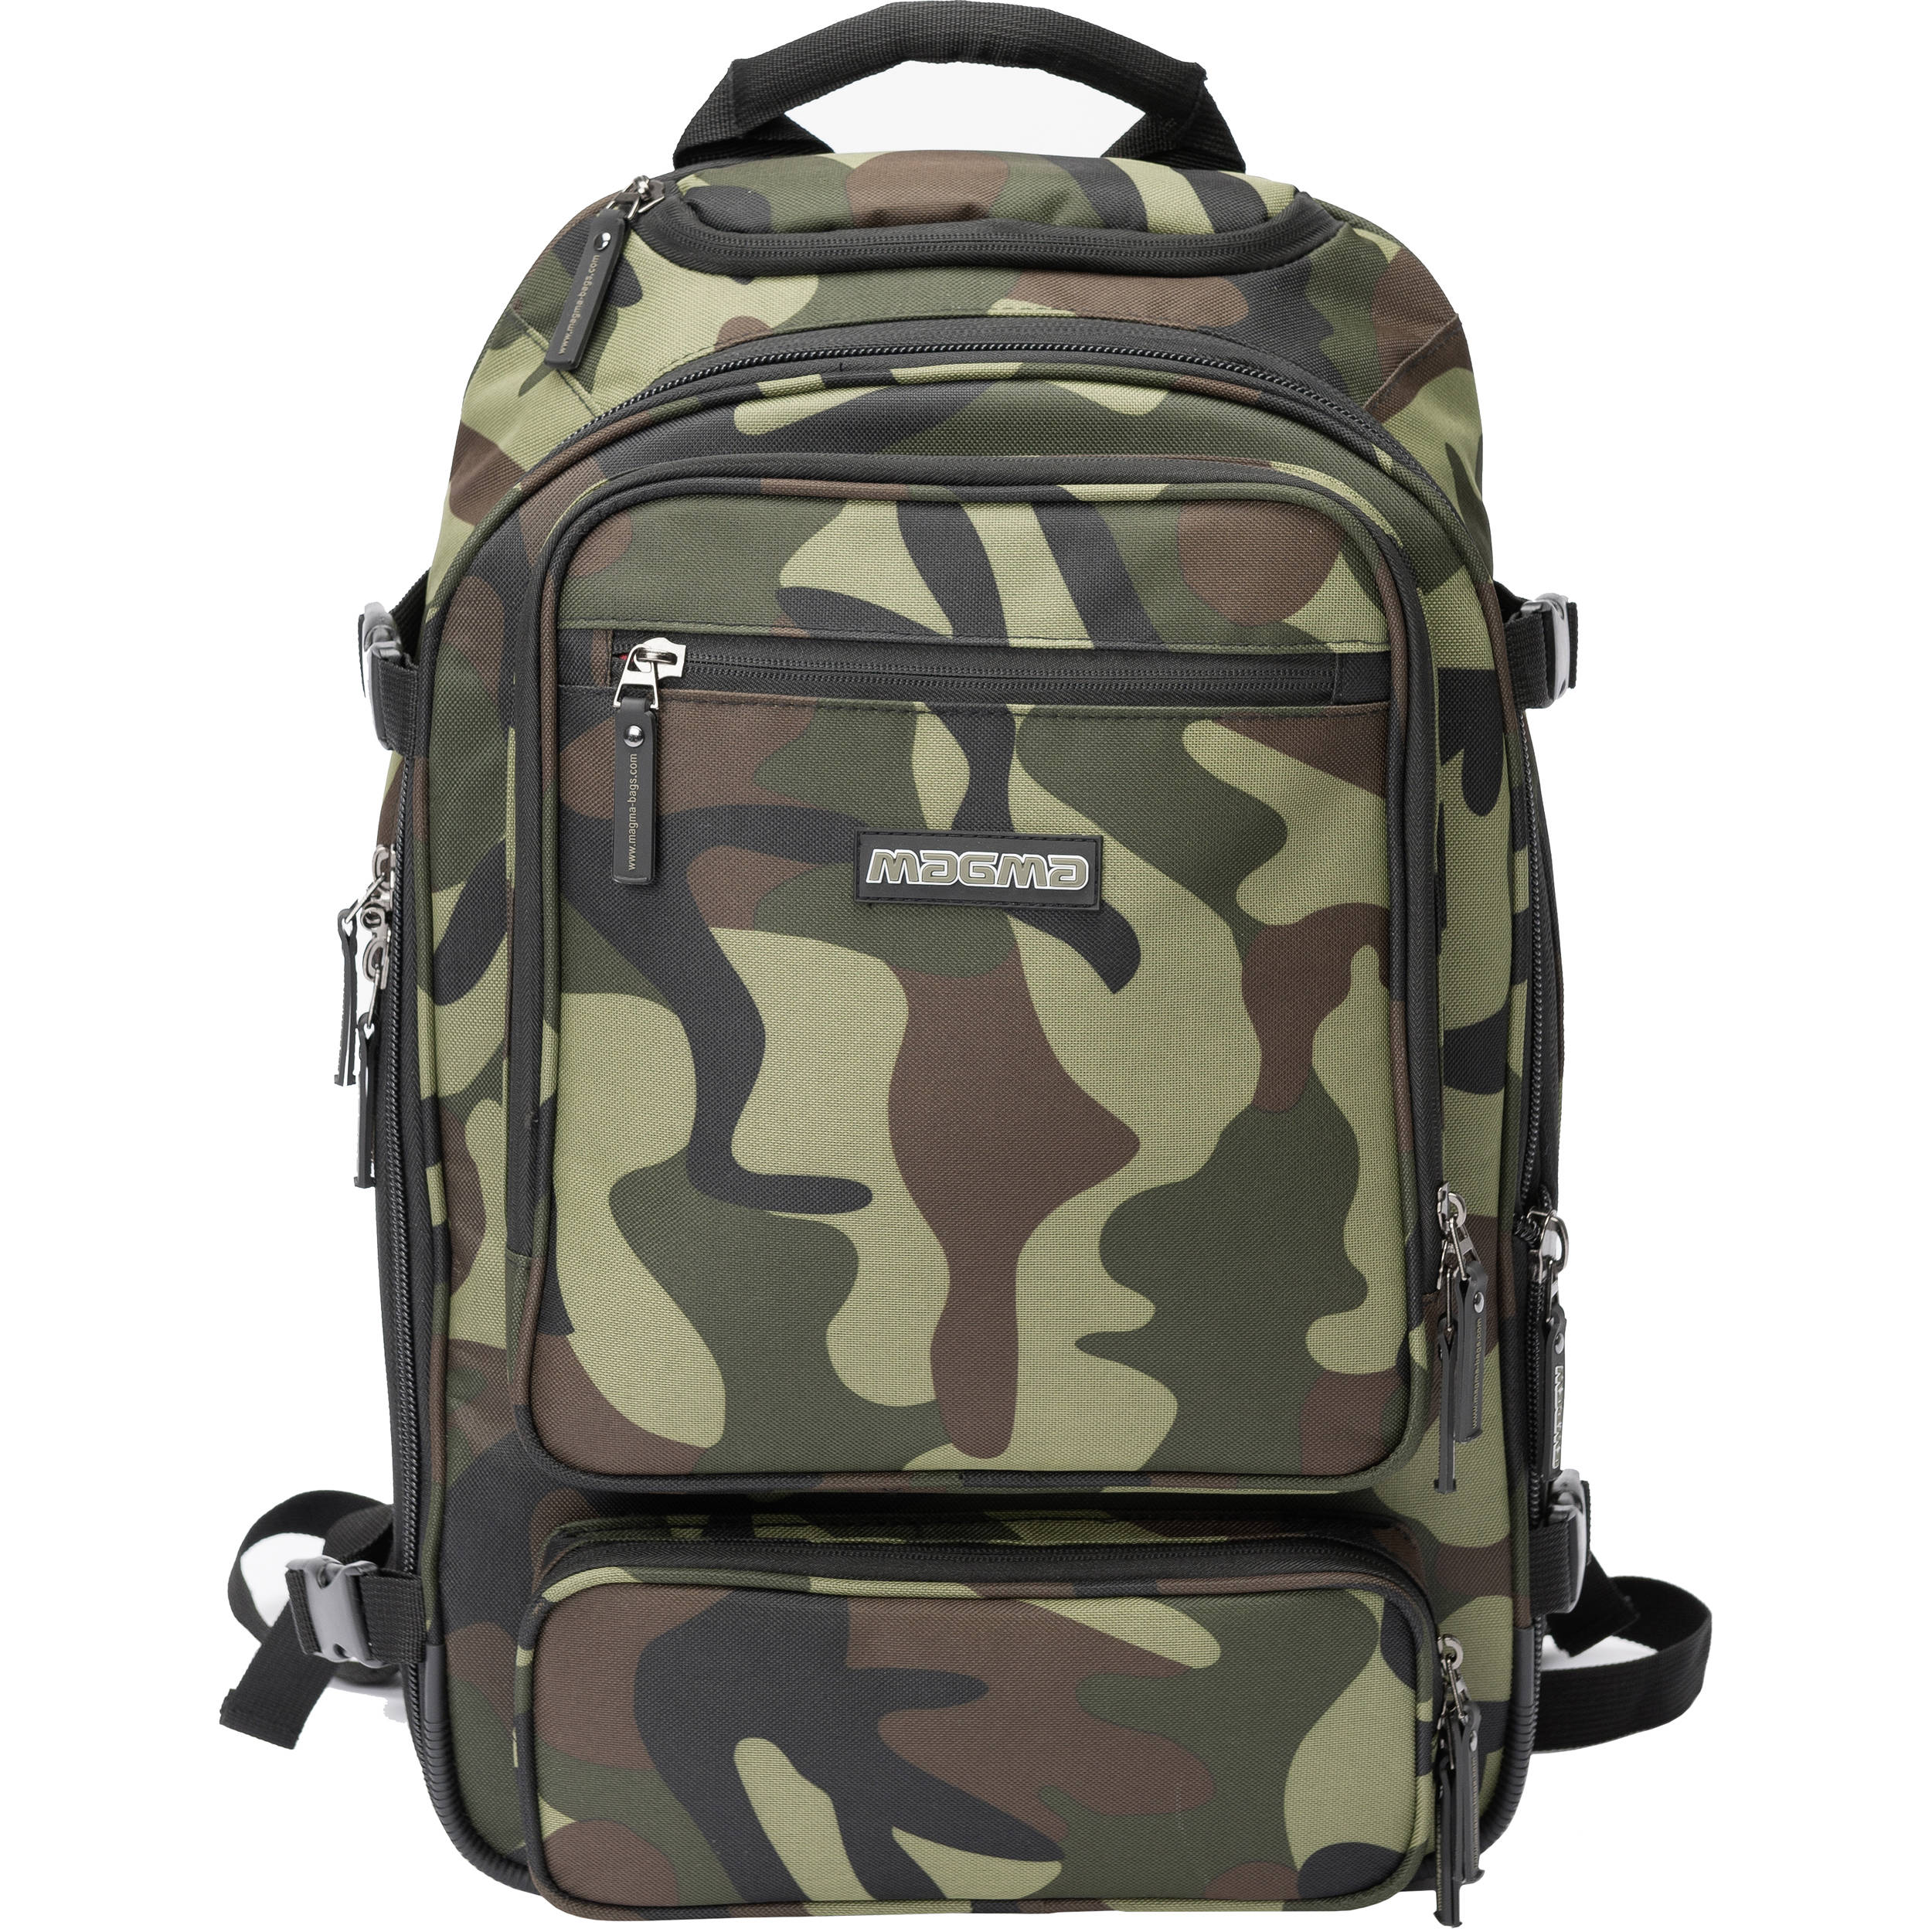 Magma Bags Digi Dj Backpack Camo Green Red